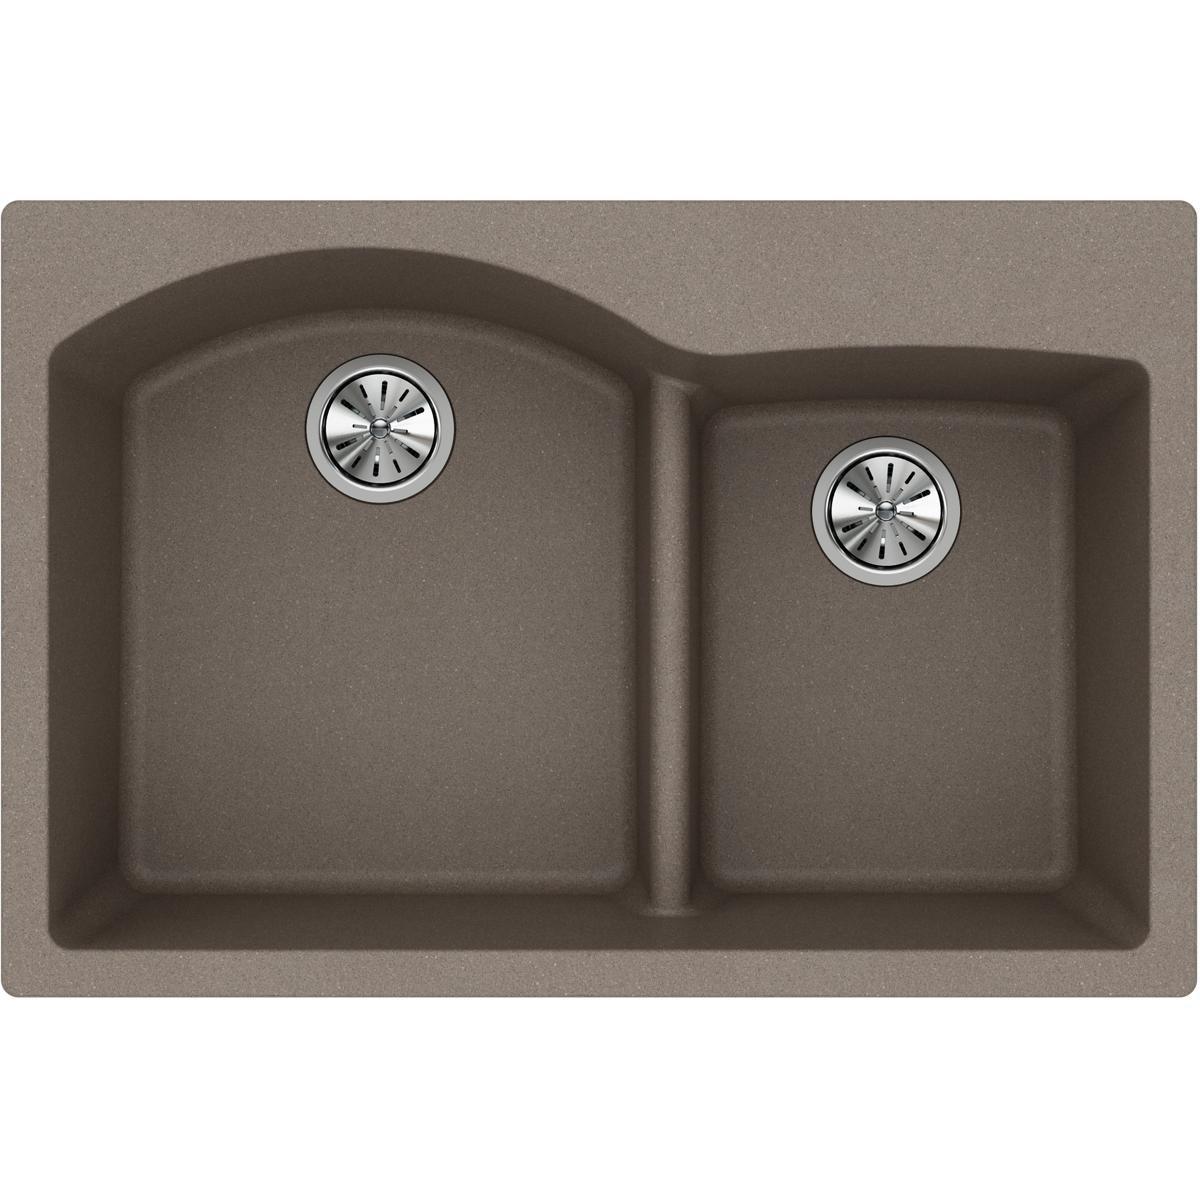 Elkay Quartz Classic ELGH3322RGR0 Greige Offset 60/40 Double Bowl Top Mount Sink